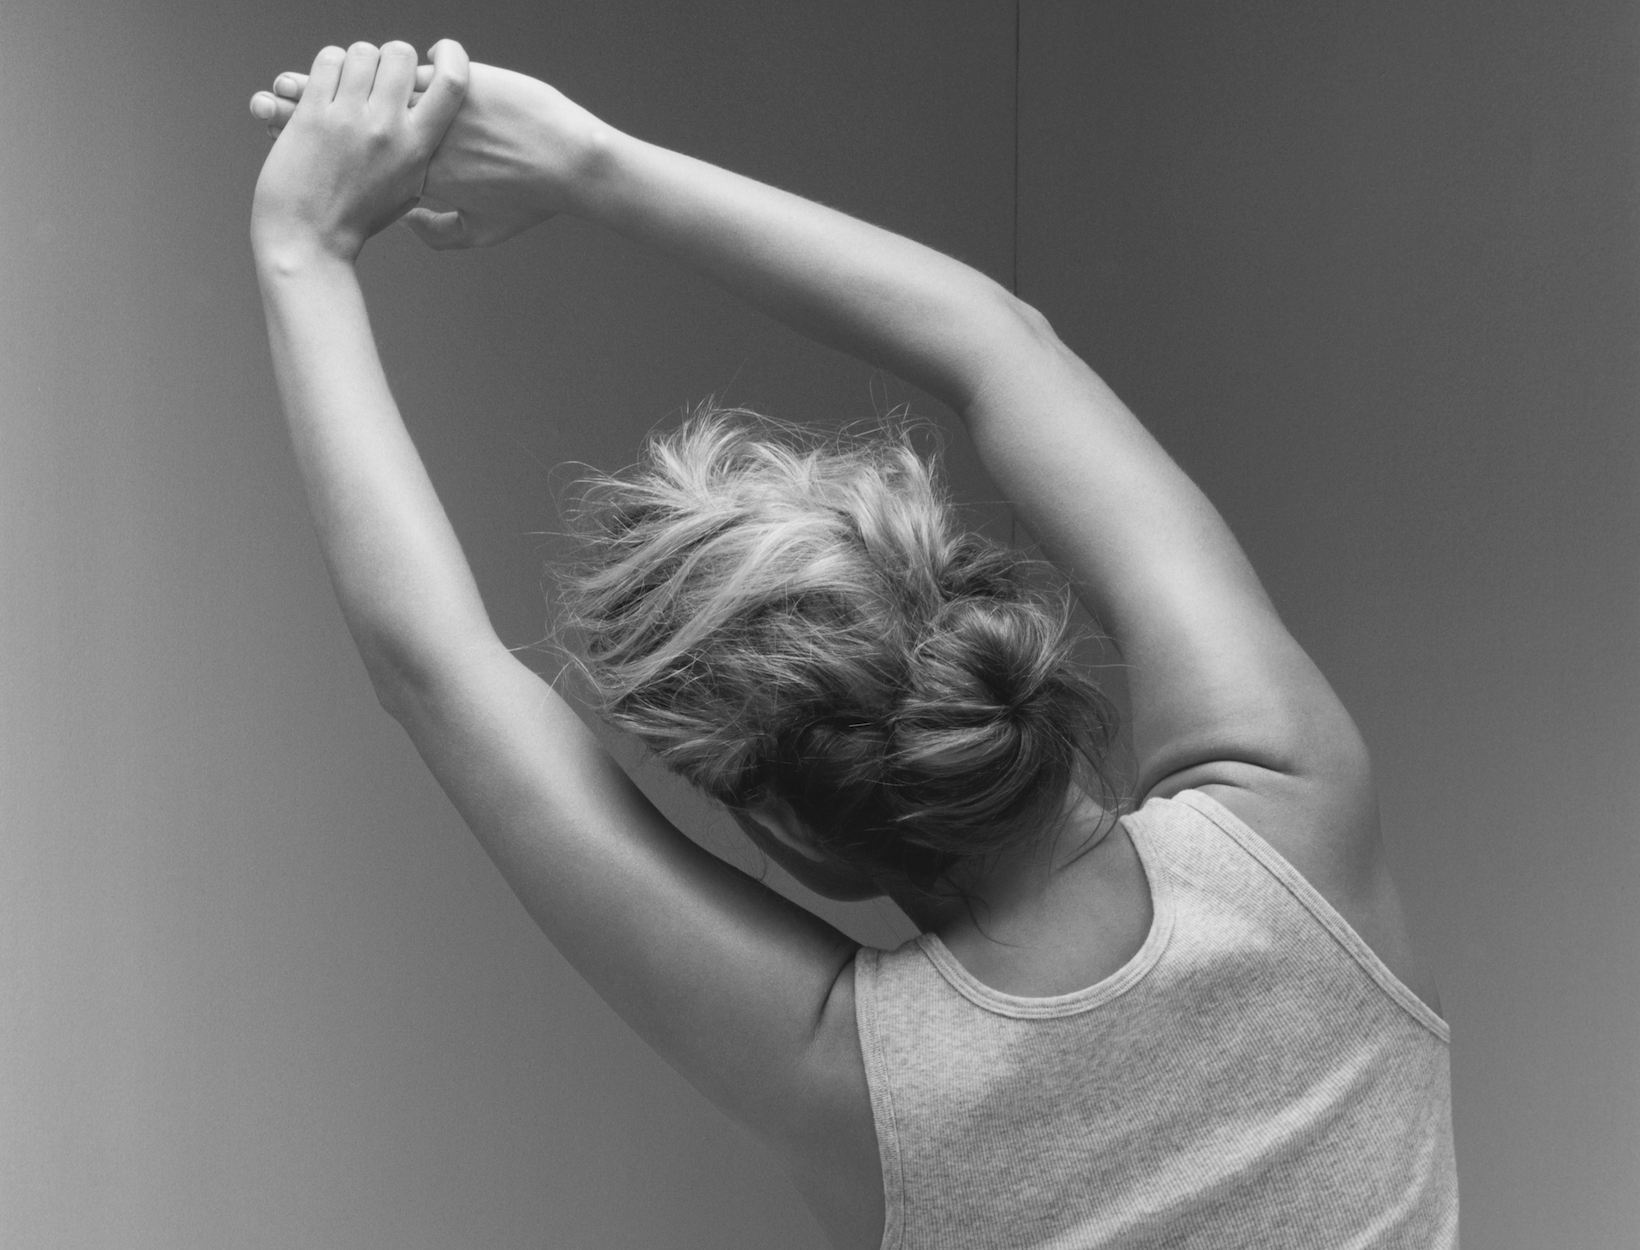 Demystifying Frozen Shoulder, Plus Exercises That Can Help   Goop